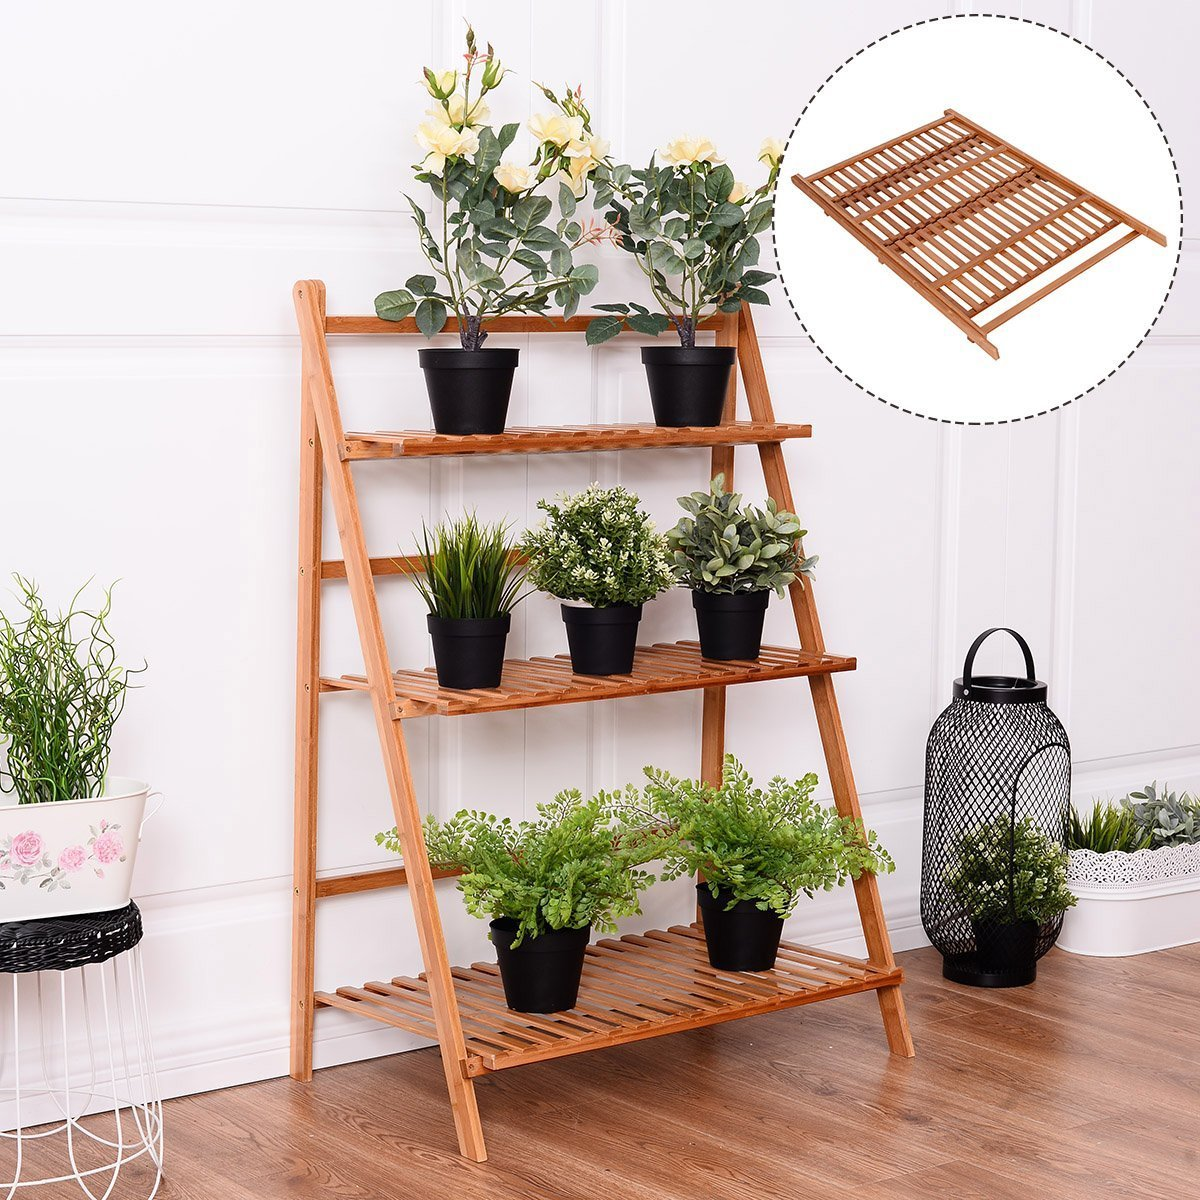 Costway 3 Tier Folding Bamboo Stand Flower Plant Pot Display Shelf Ladder Garden Outdoor